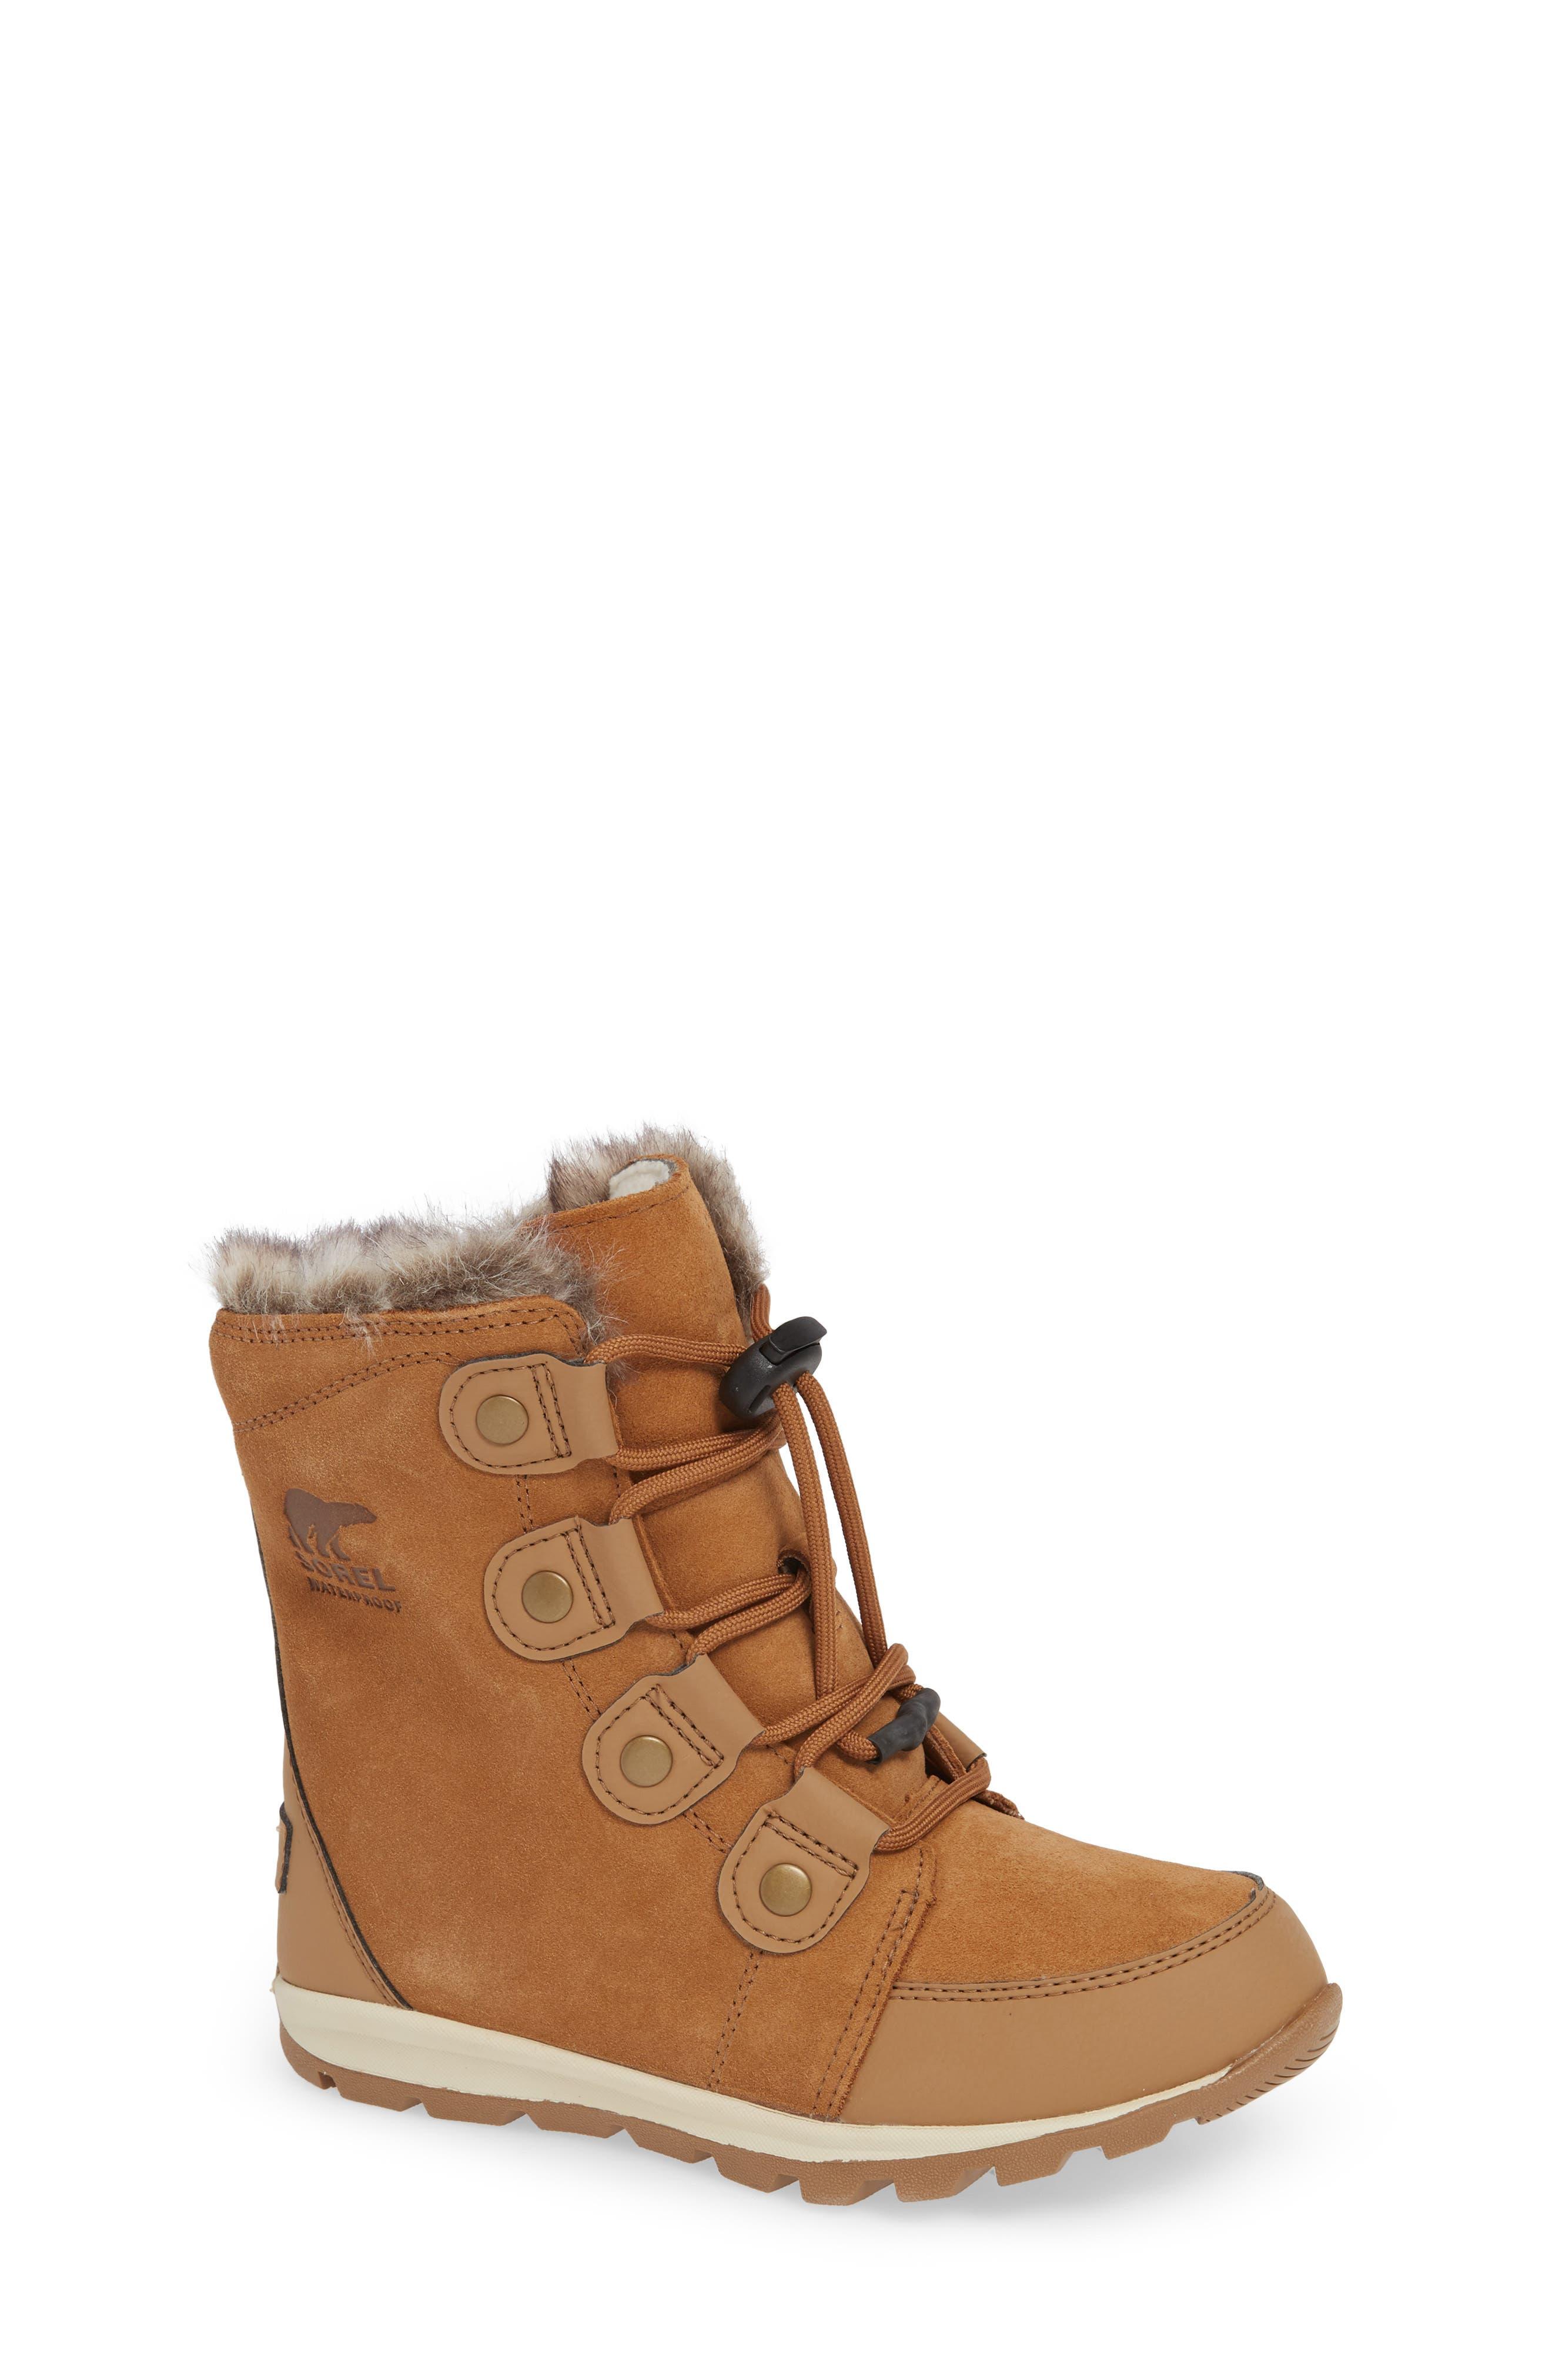 Whitney Suede Waterproof Faux Fur Boot,                             Main thumbnail 1, color,                             ELK/ NATURAL